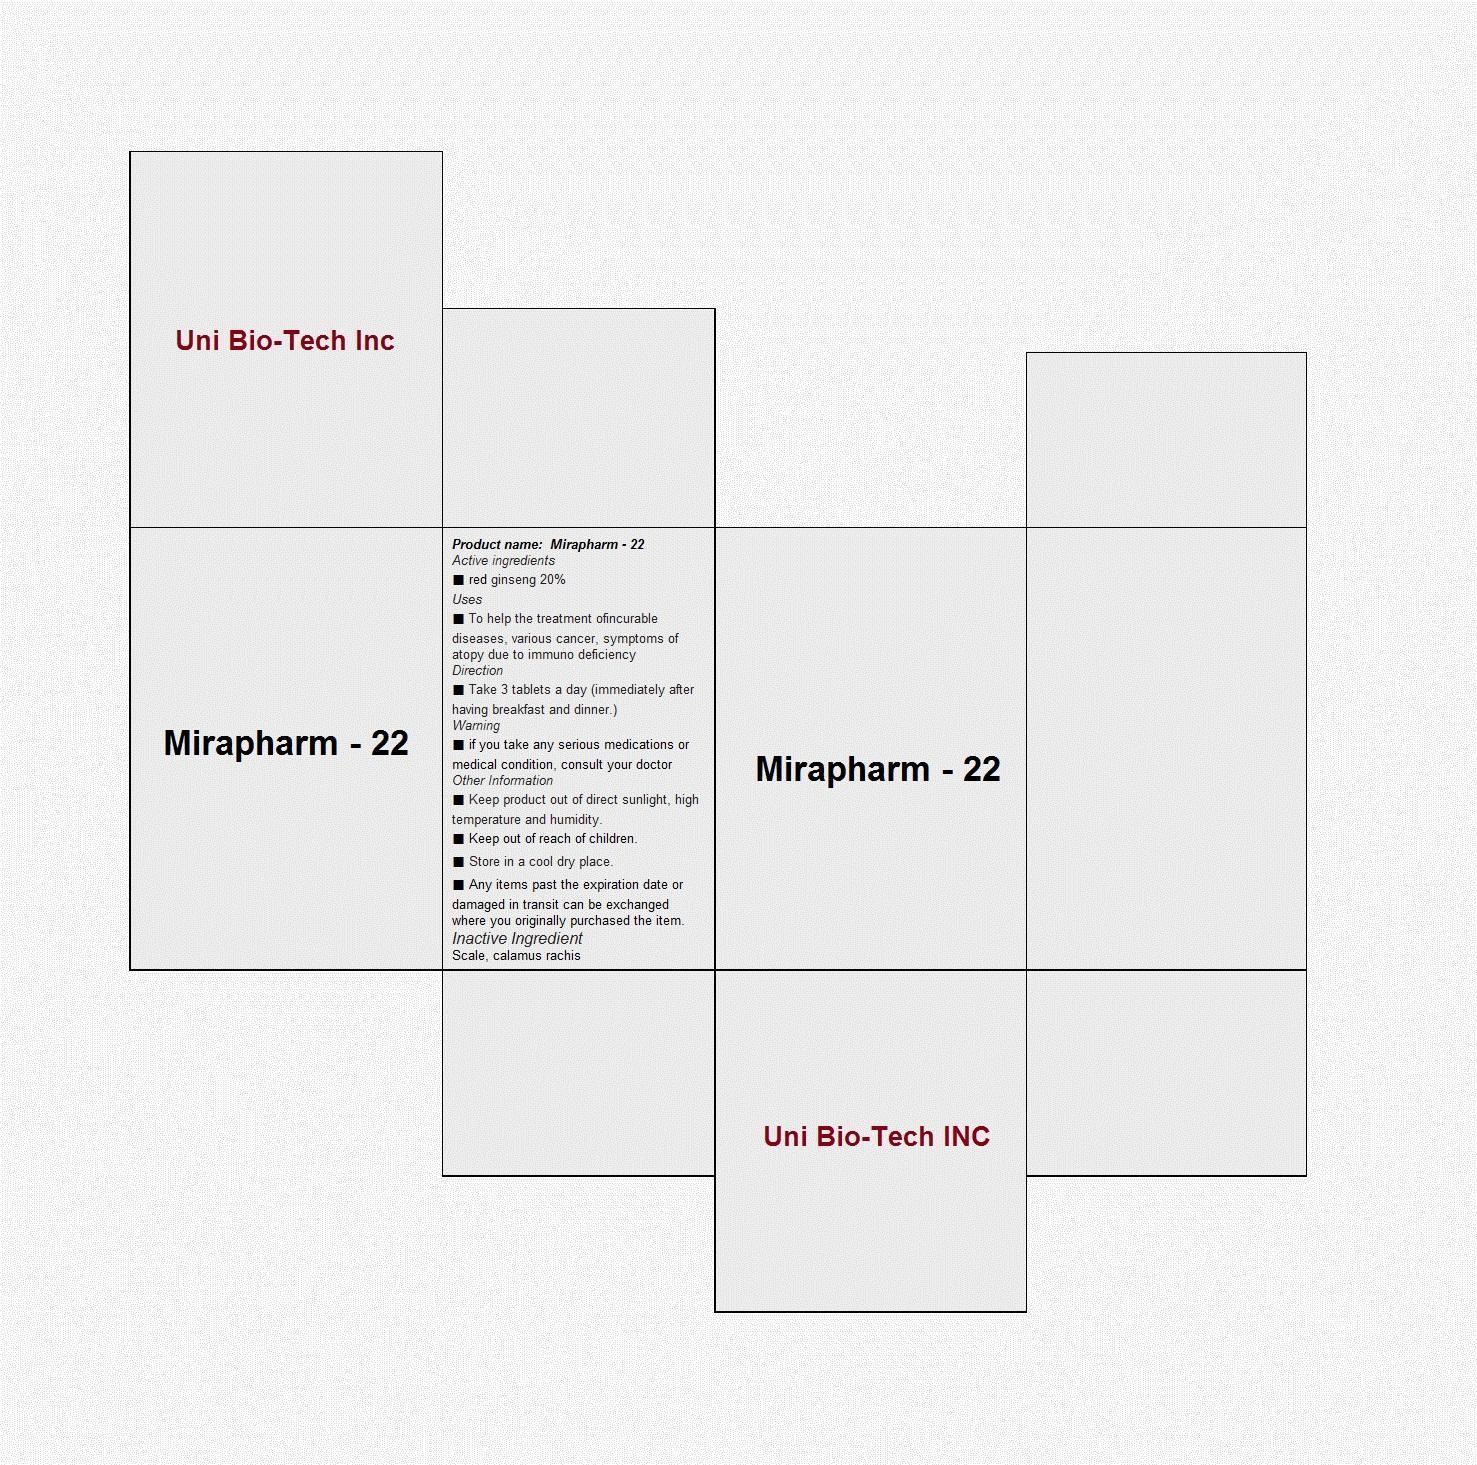 Mirapharm-22 (Panax Ginseng Whole) Capsule [Uni Bio-tech Inc ]